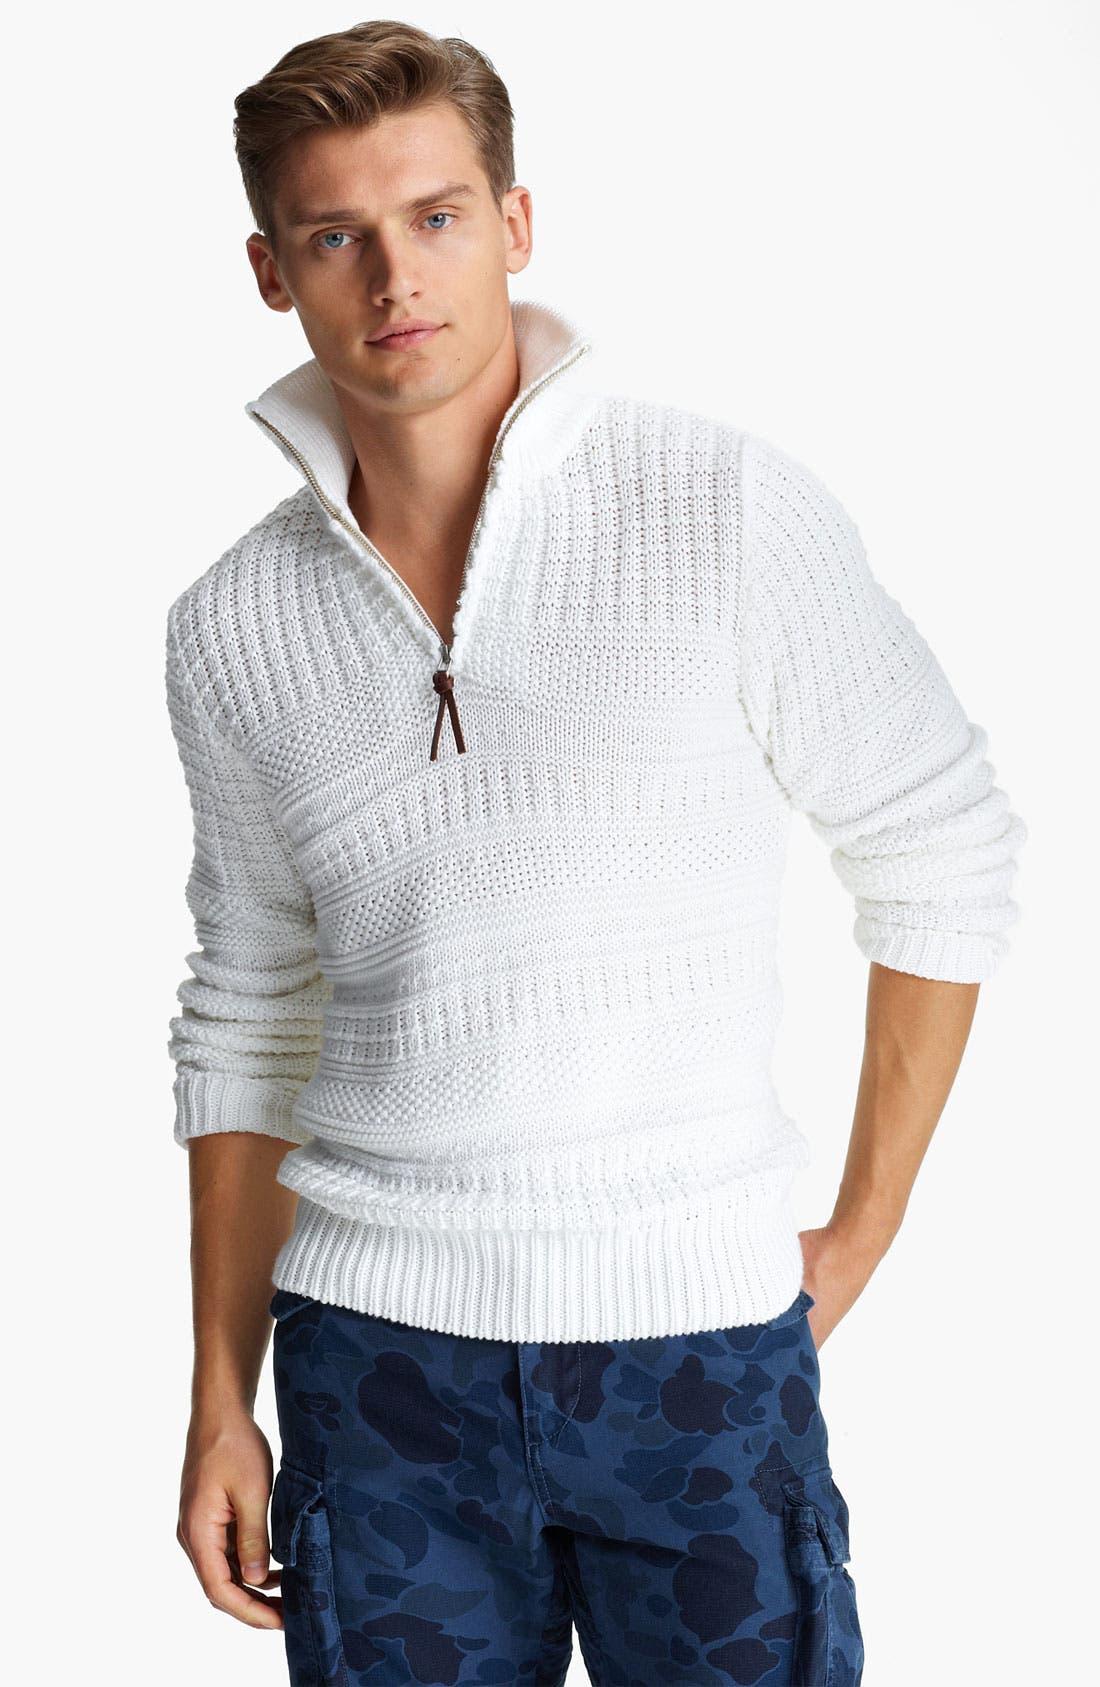 Main Image - Gant by Michael Bastian Quarter Zip Pullover Sweater